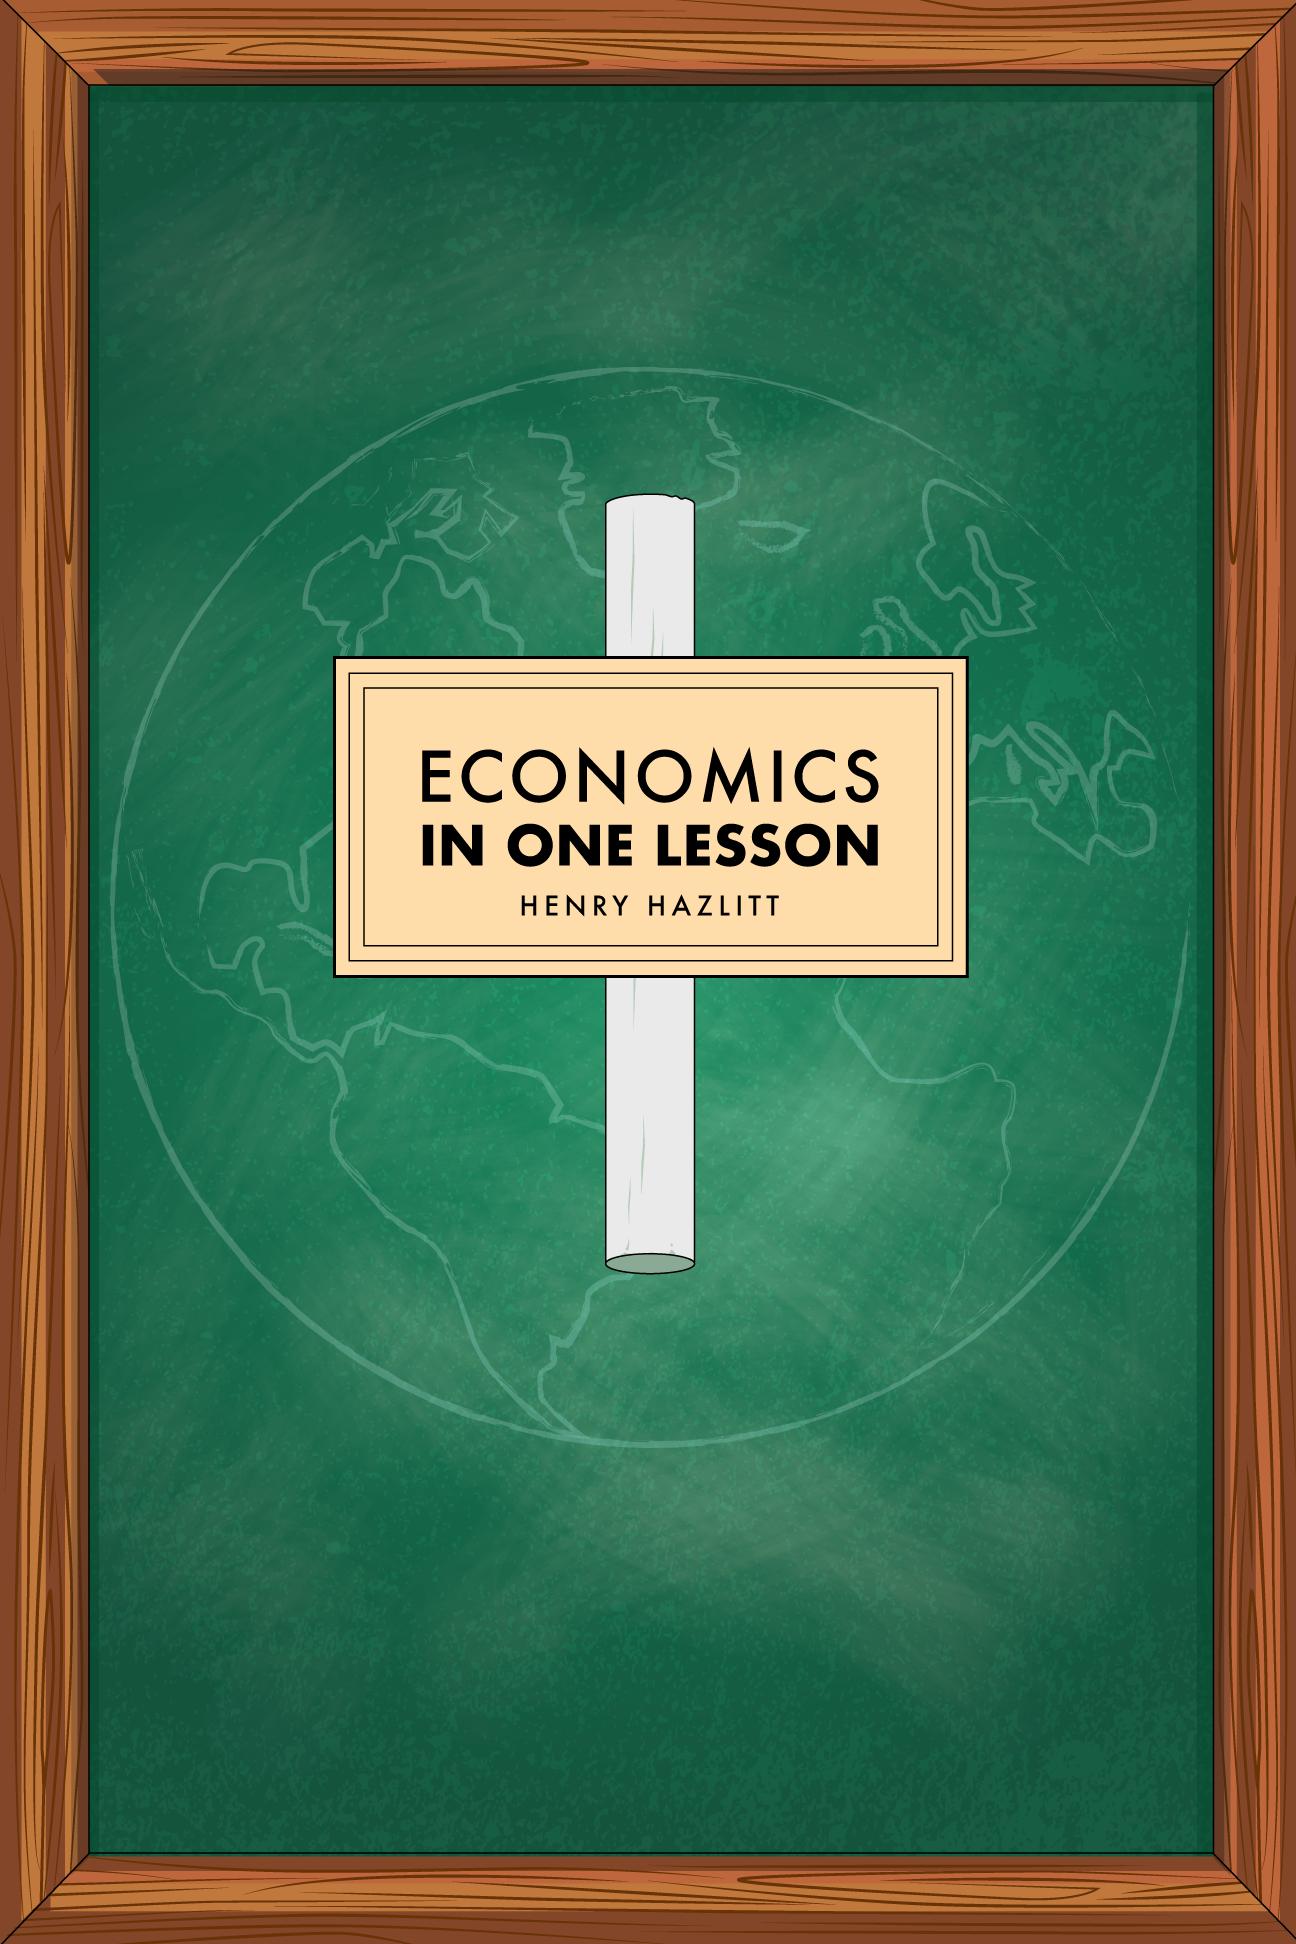 economics in one lesson audiobook